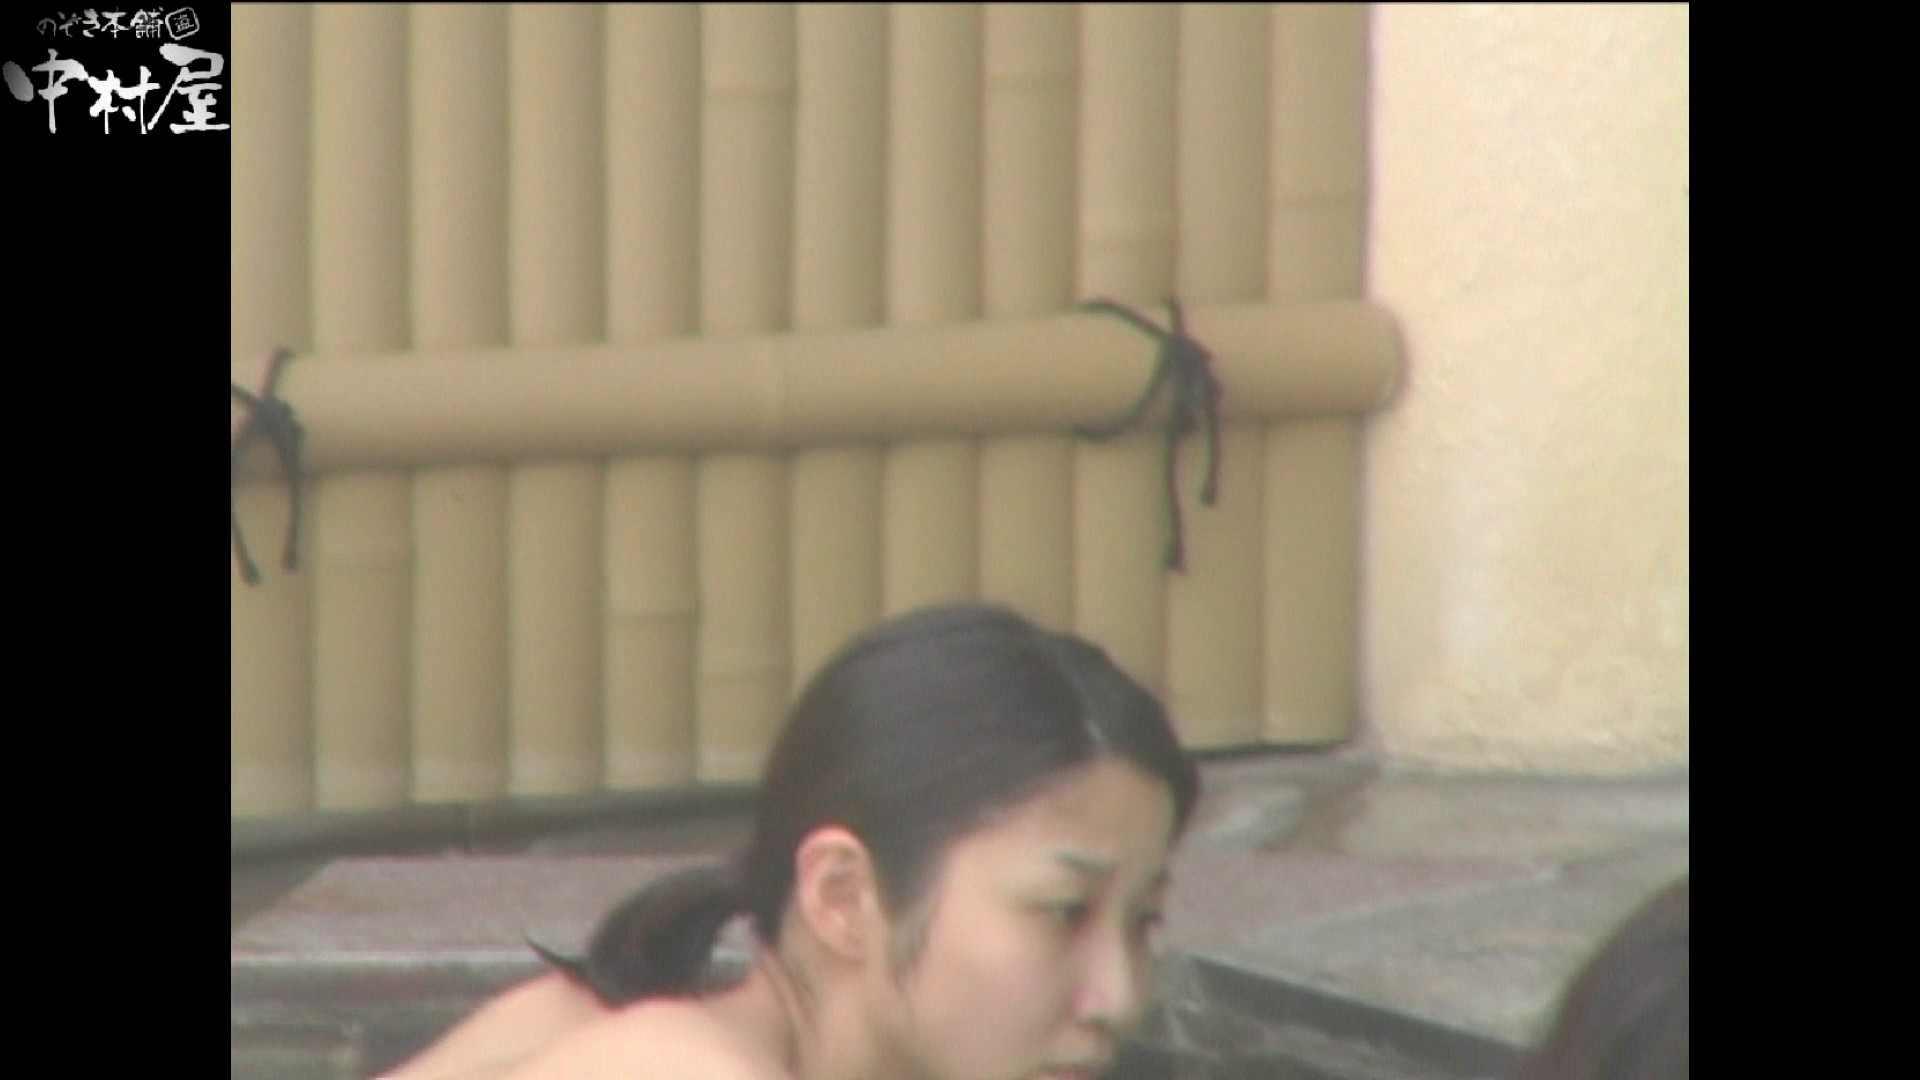 Aquaな露天風呂Vol.898 盗撮シリーズ   露天風呂編  110PIX 75